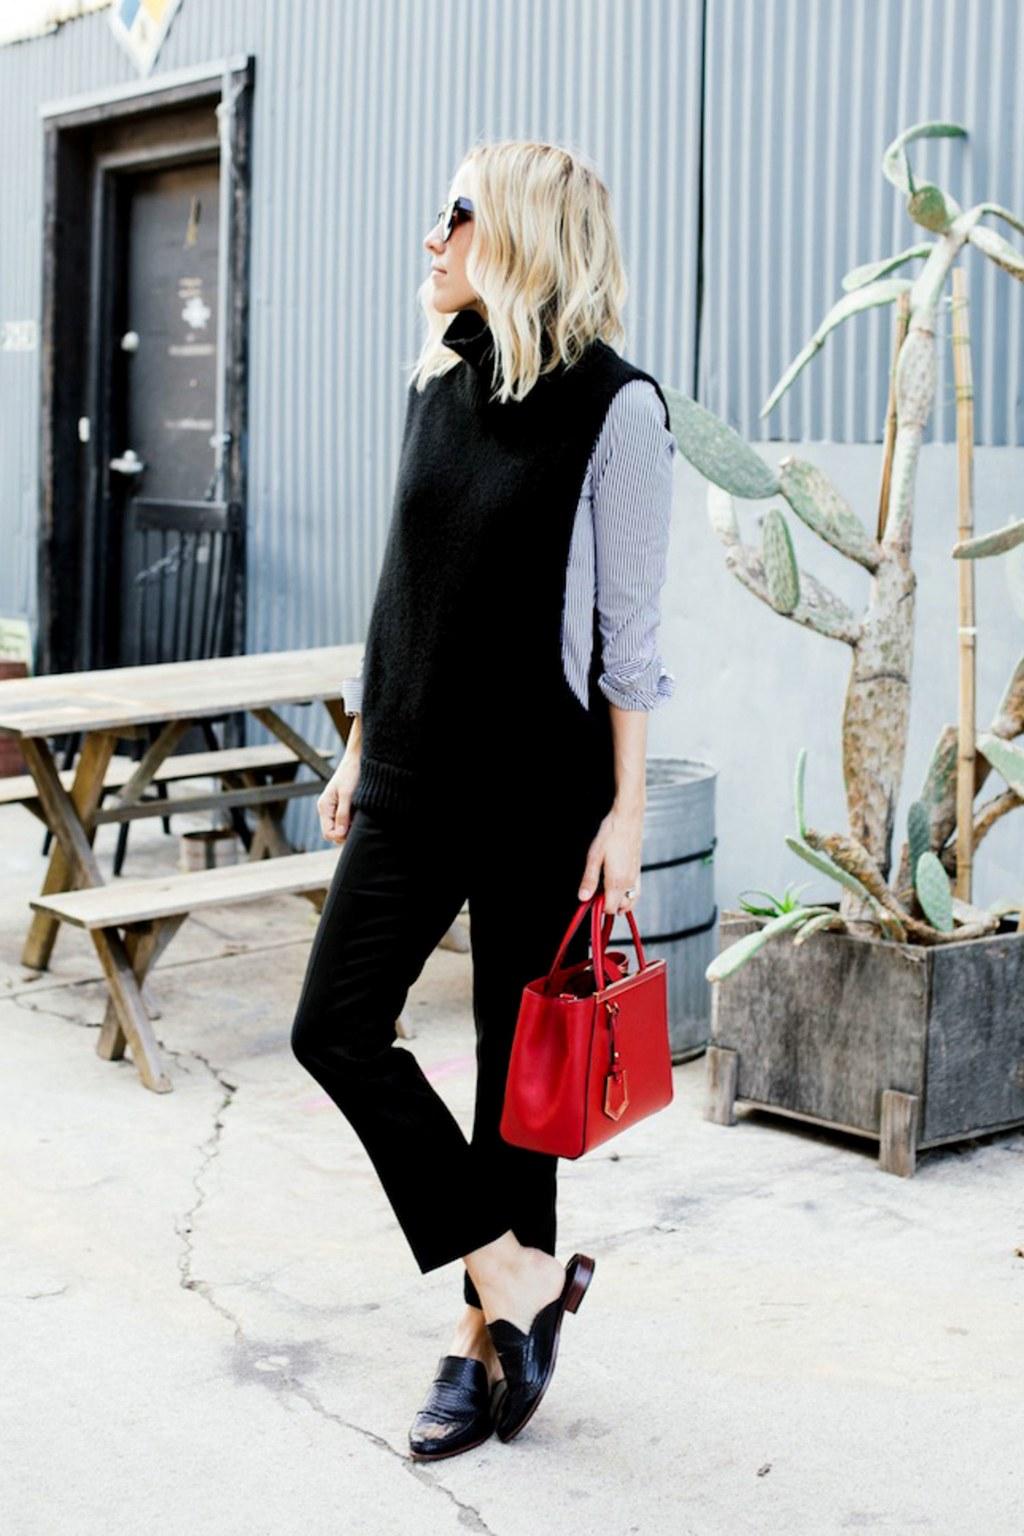 sapato preto do clássico ao street style